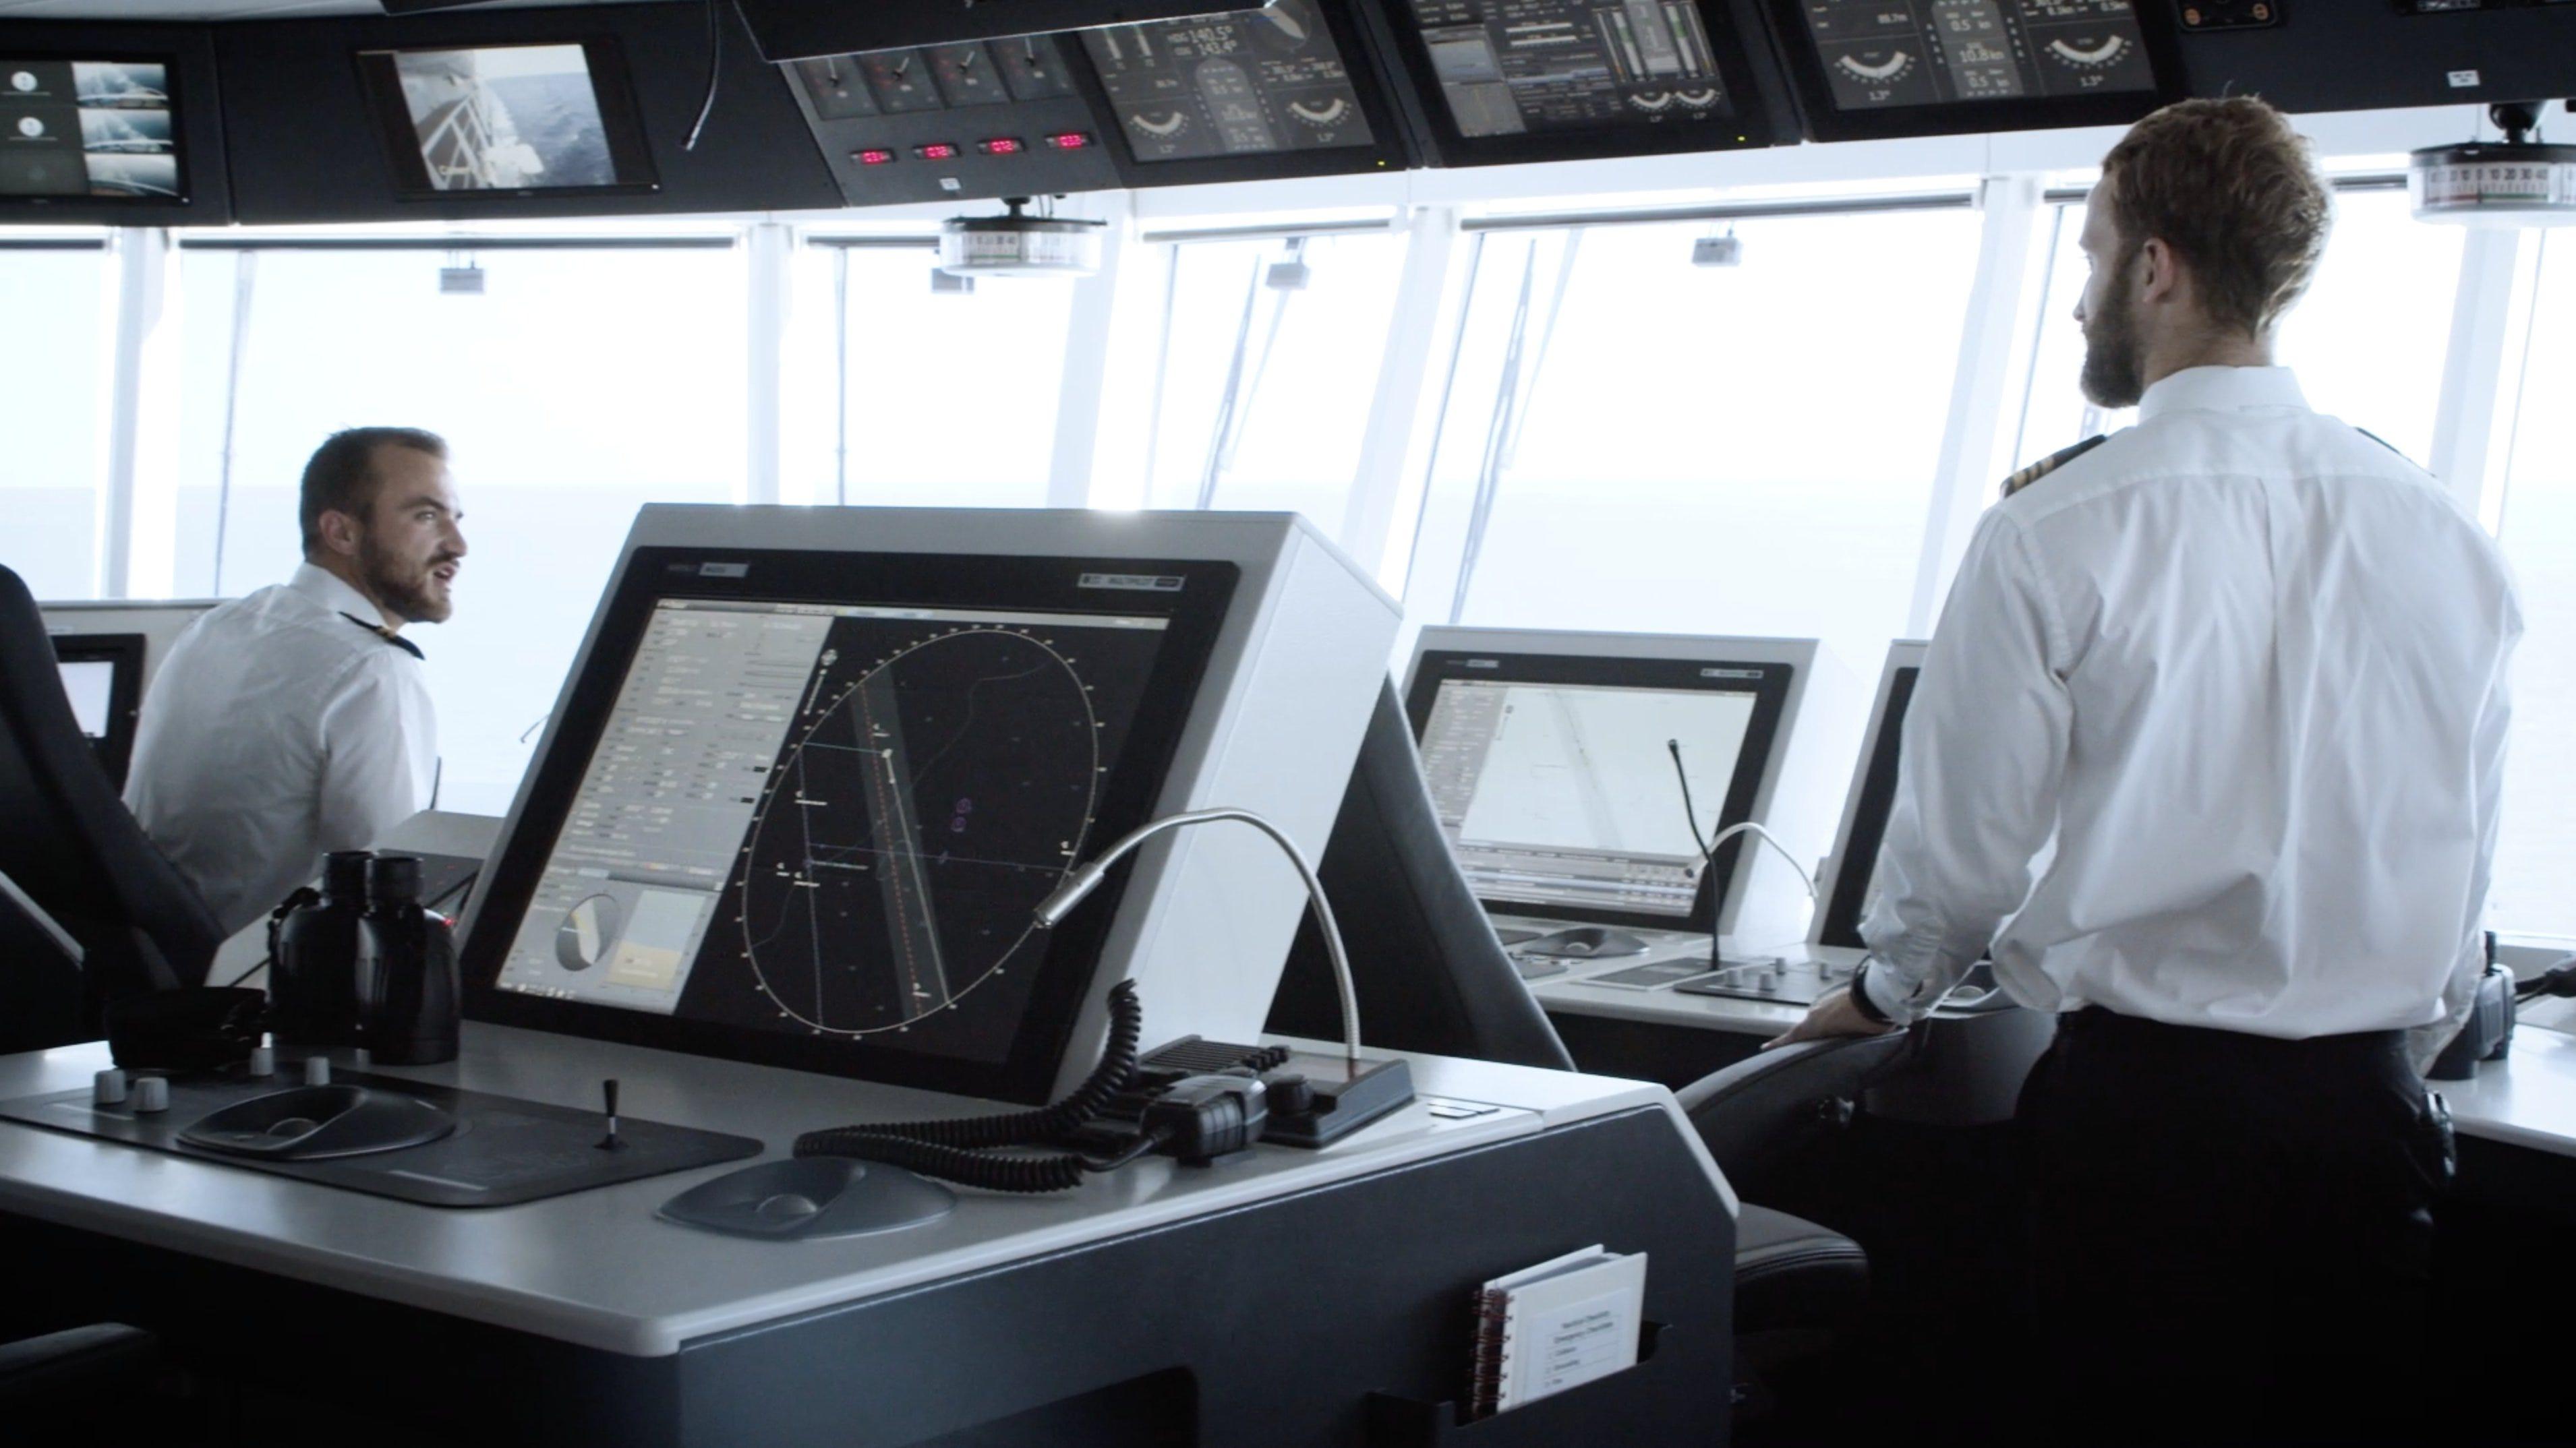 Princess Cruises' newest ship, Sky Princess, kicks off inaugural season in Europe